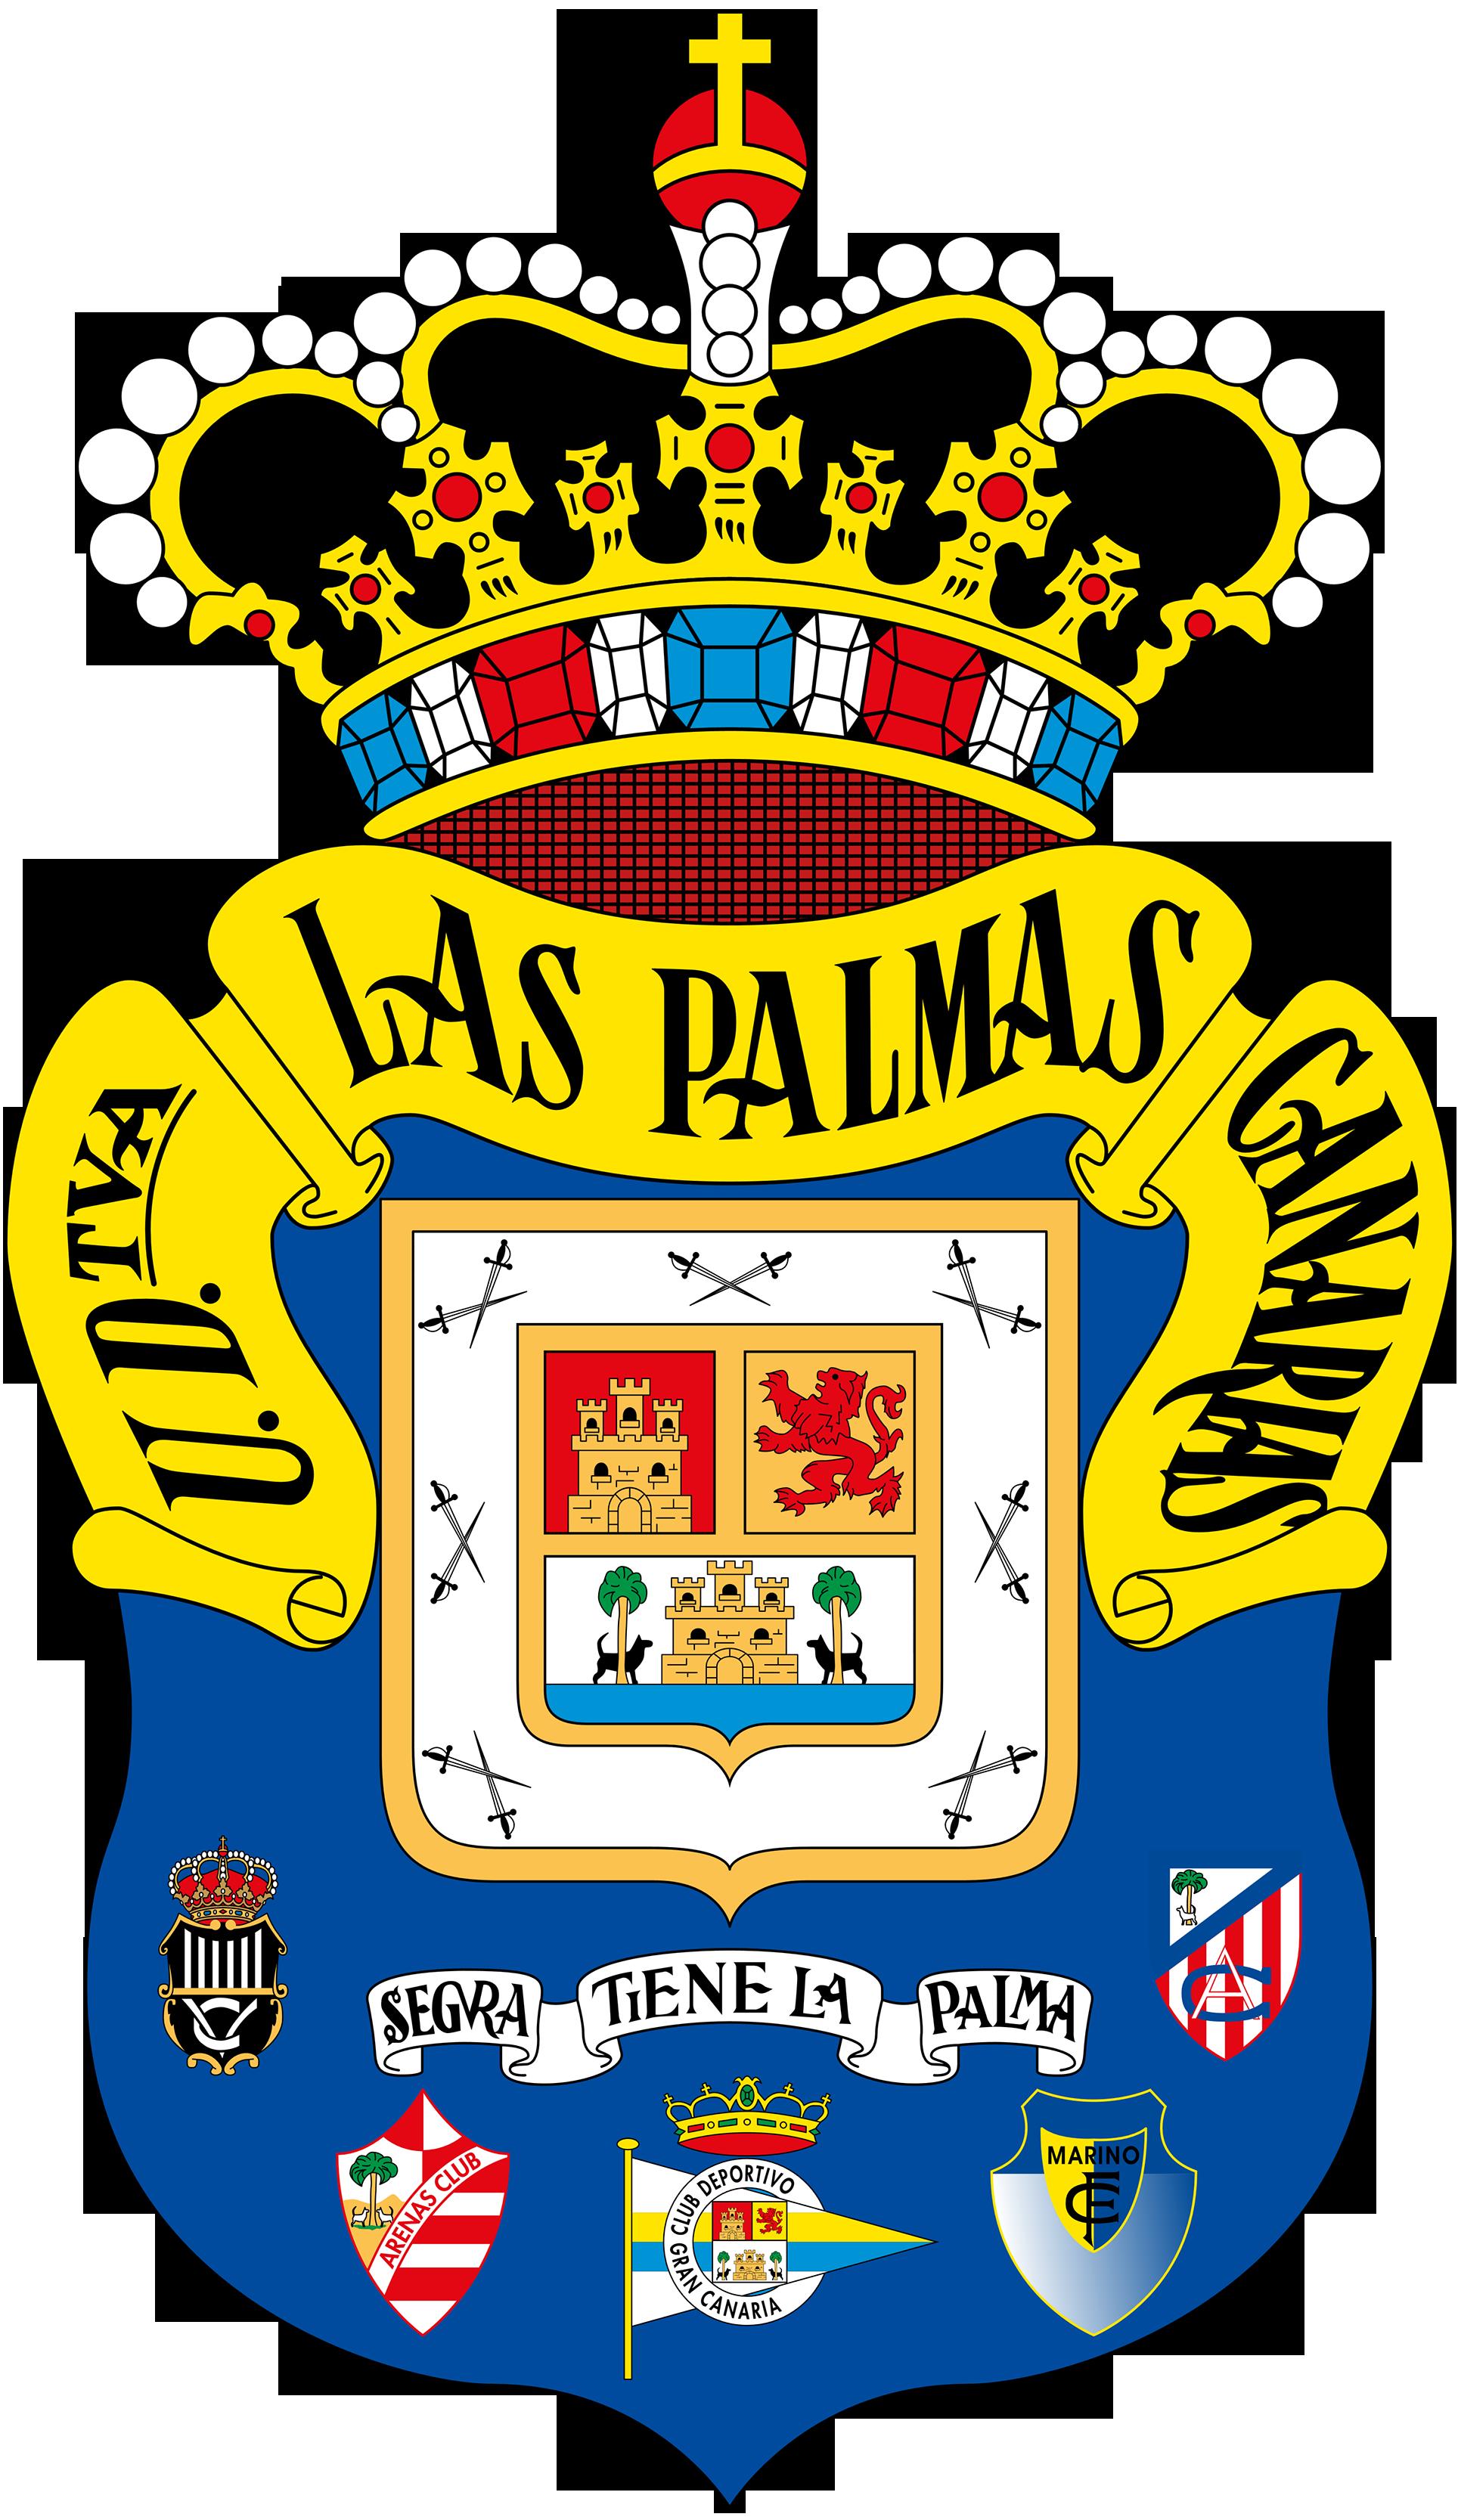 Las Palmas Fifa Football Gaming Wiki Fandom Powered By Wikia